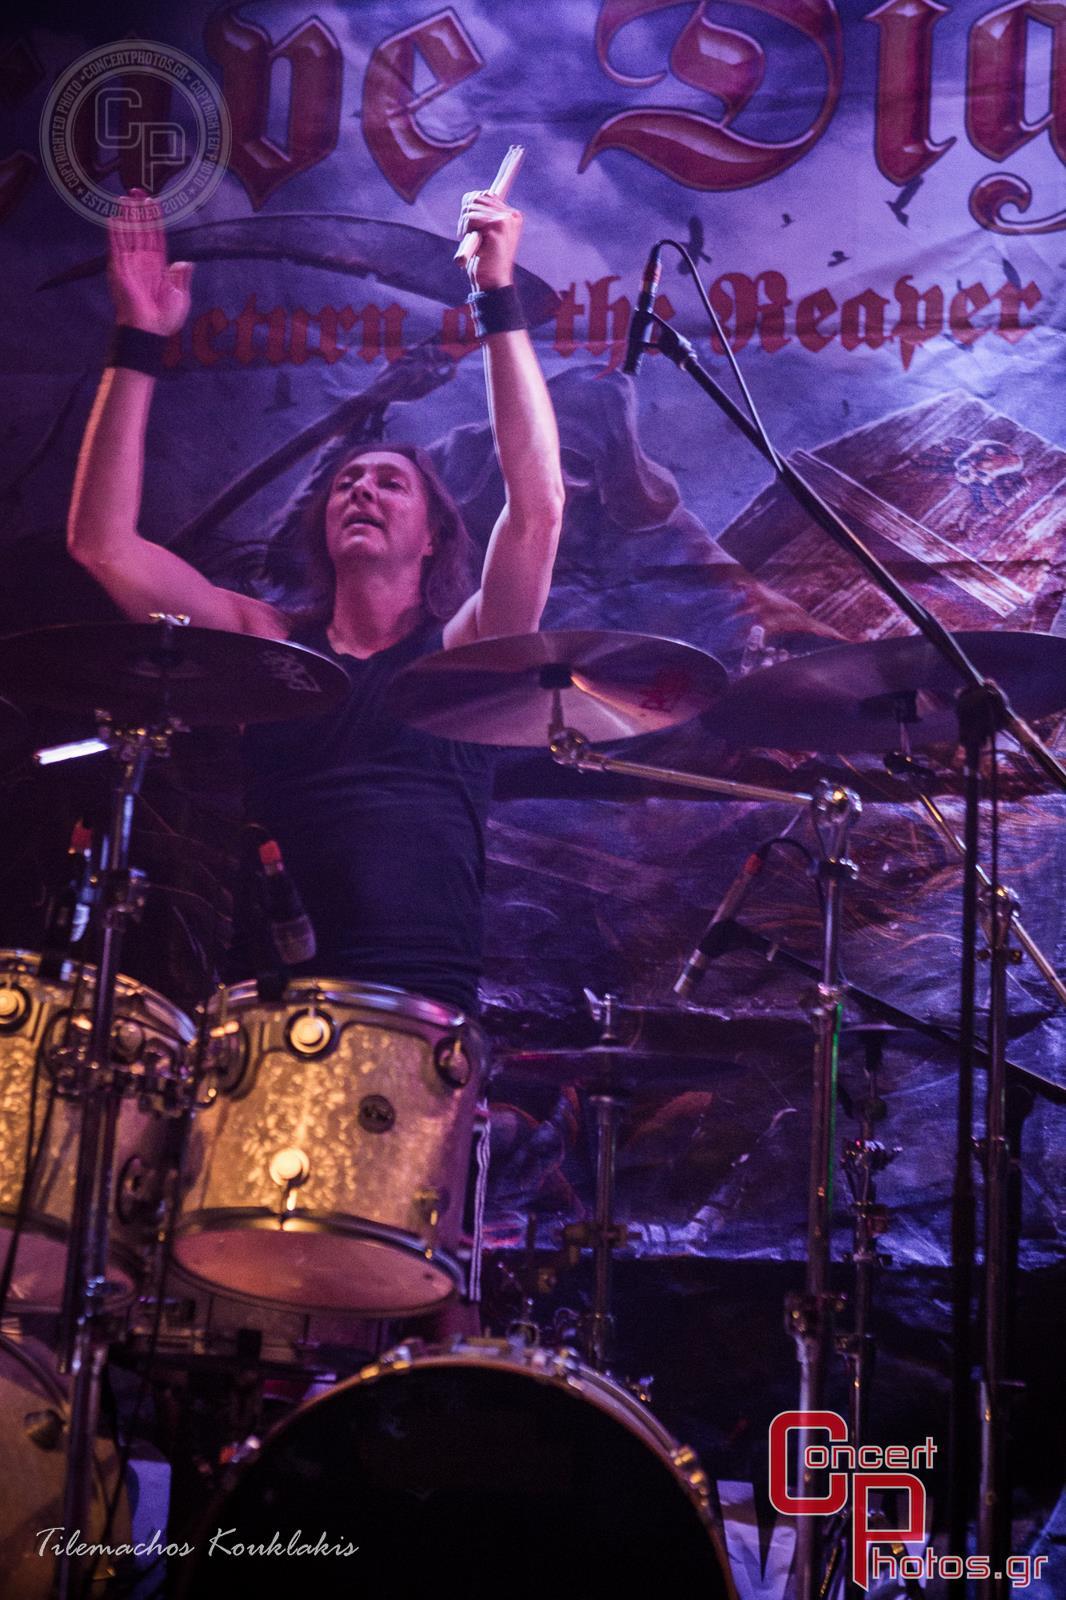 Grave Digger & Silent Rage -Grave Digger Silent Rage Kyttaro photographer:  - ConcertPhotos - 20140919_2244_50